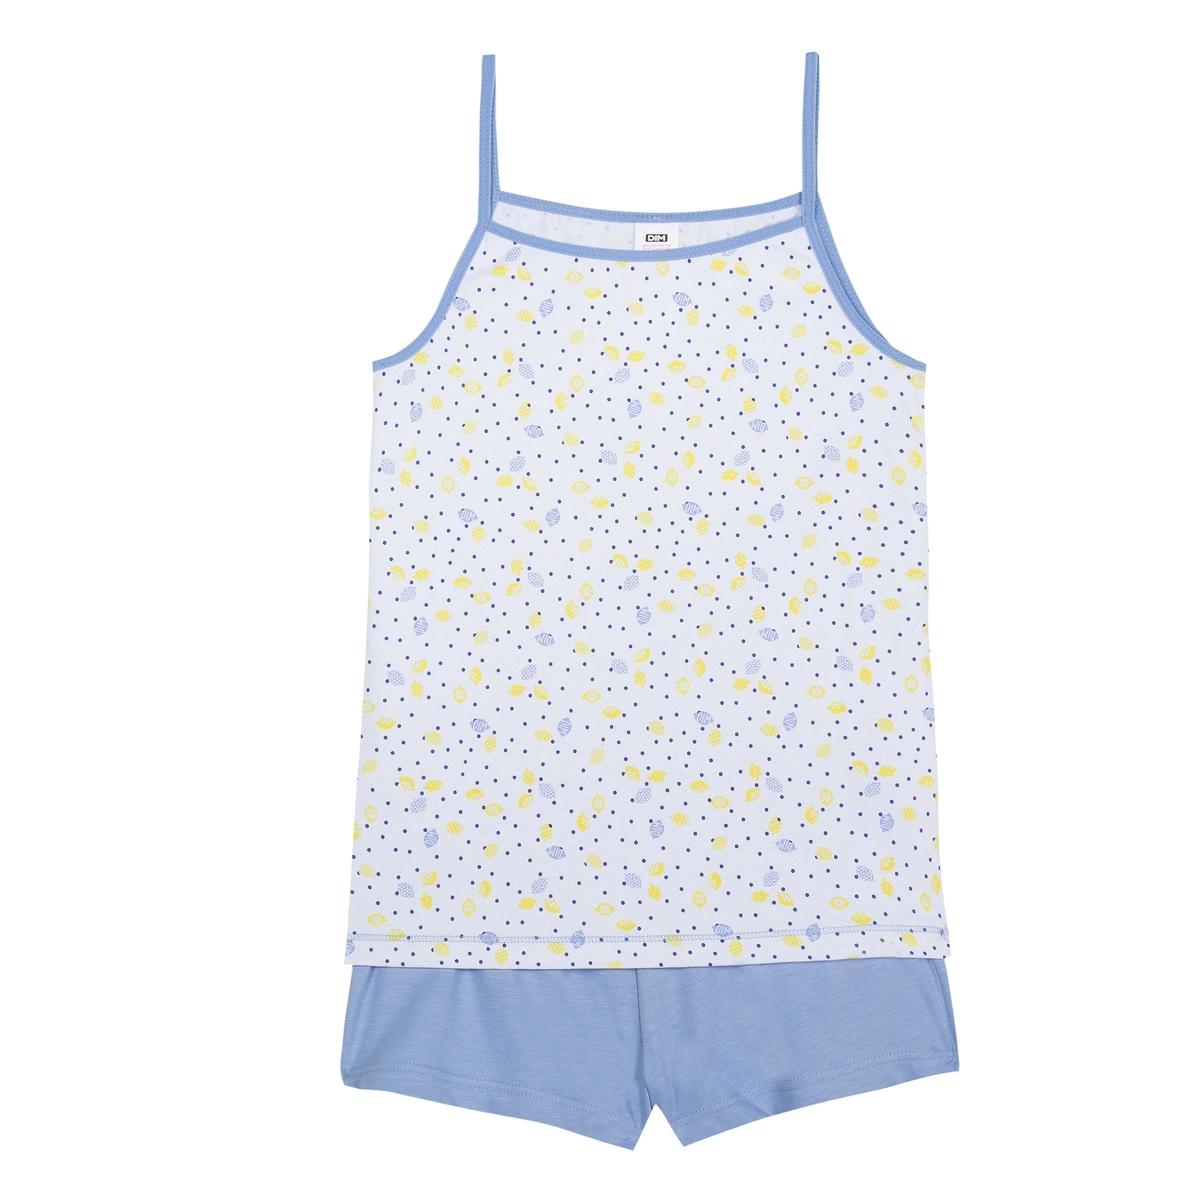 Пижама La Redoute С шортами 16 лет - 162 см синий рубашка la redoute из ткани оксфорд 16 лет 162 см синий